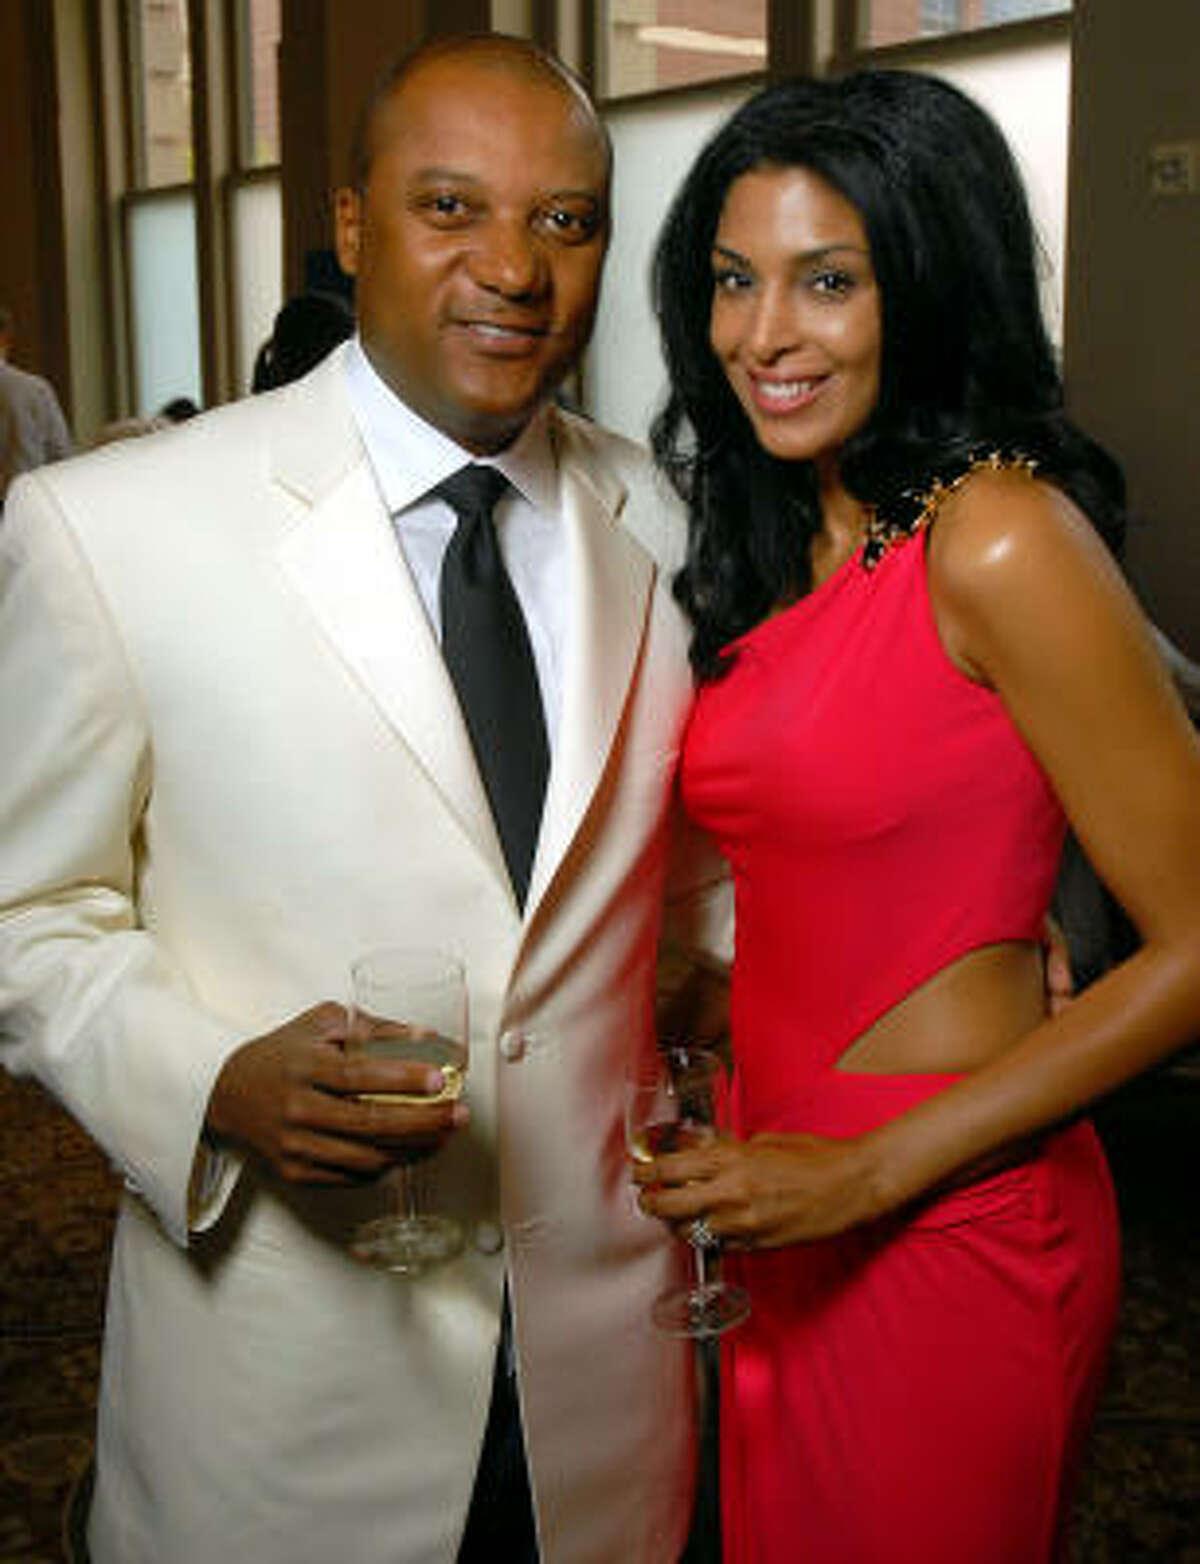 Darryl and Ursaline Hamilton